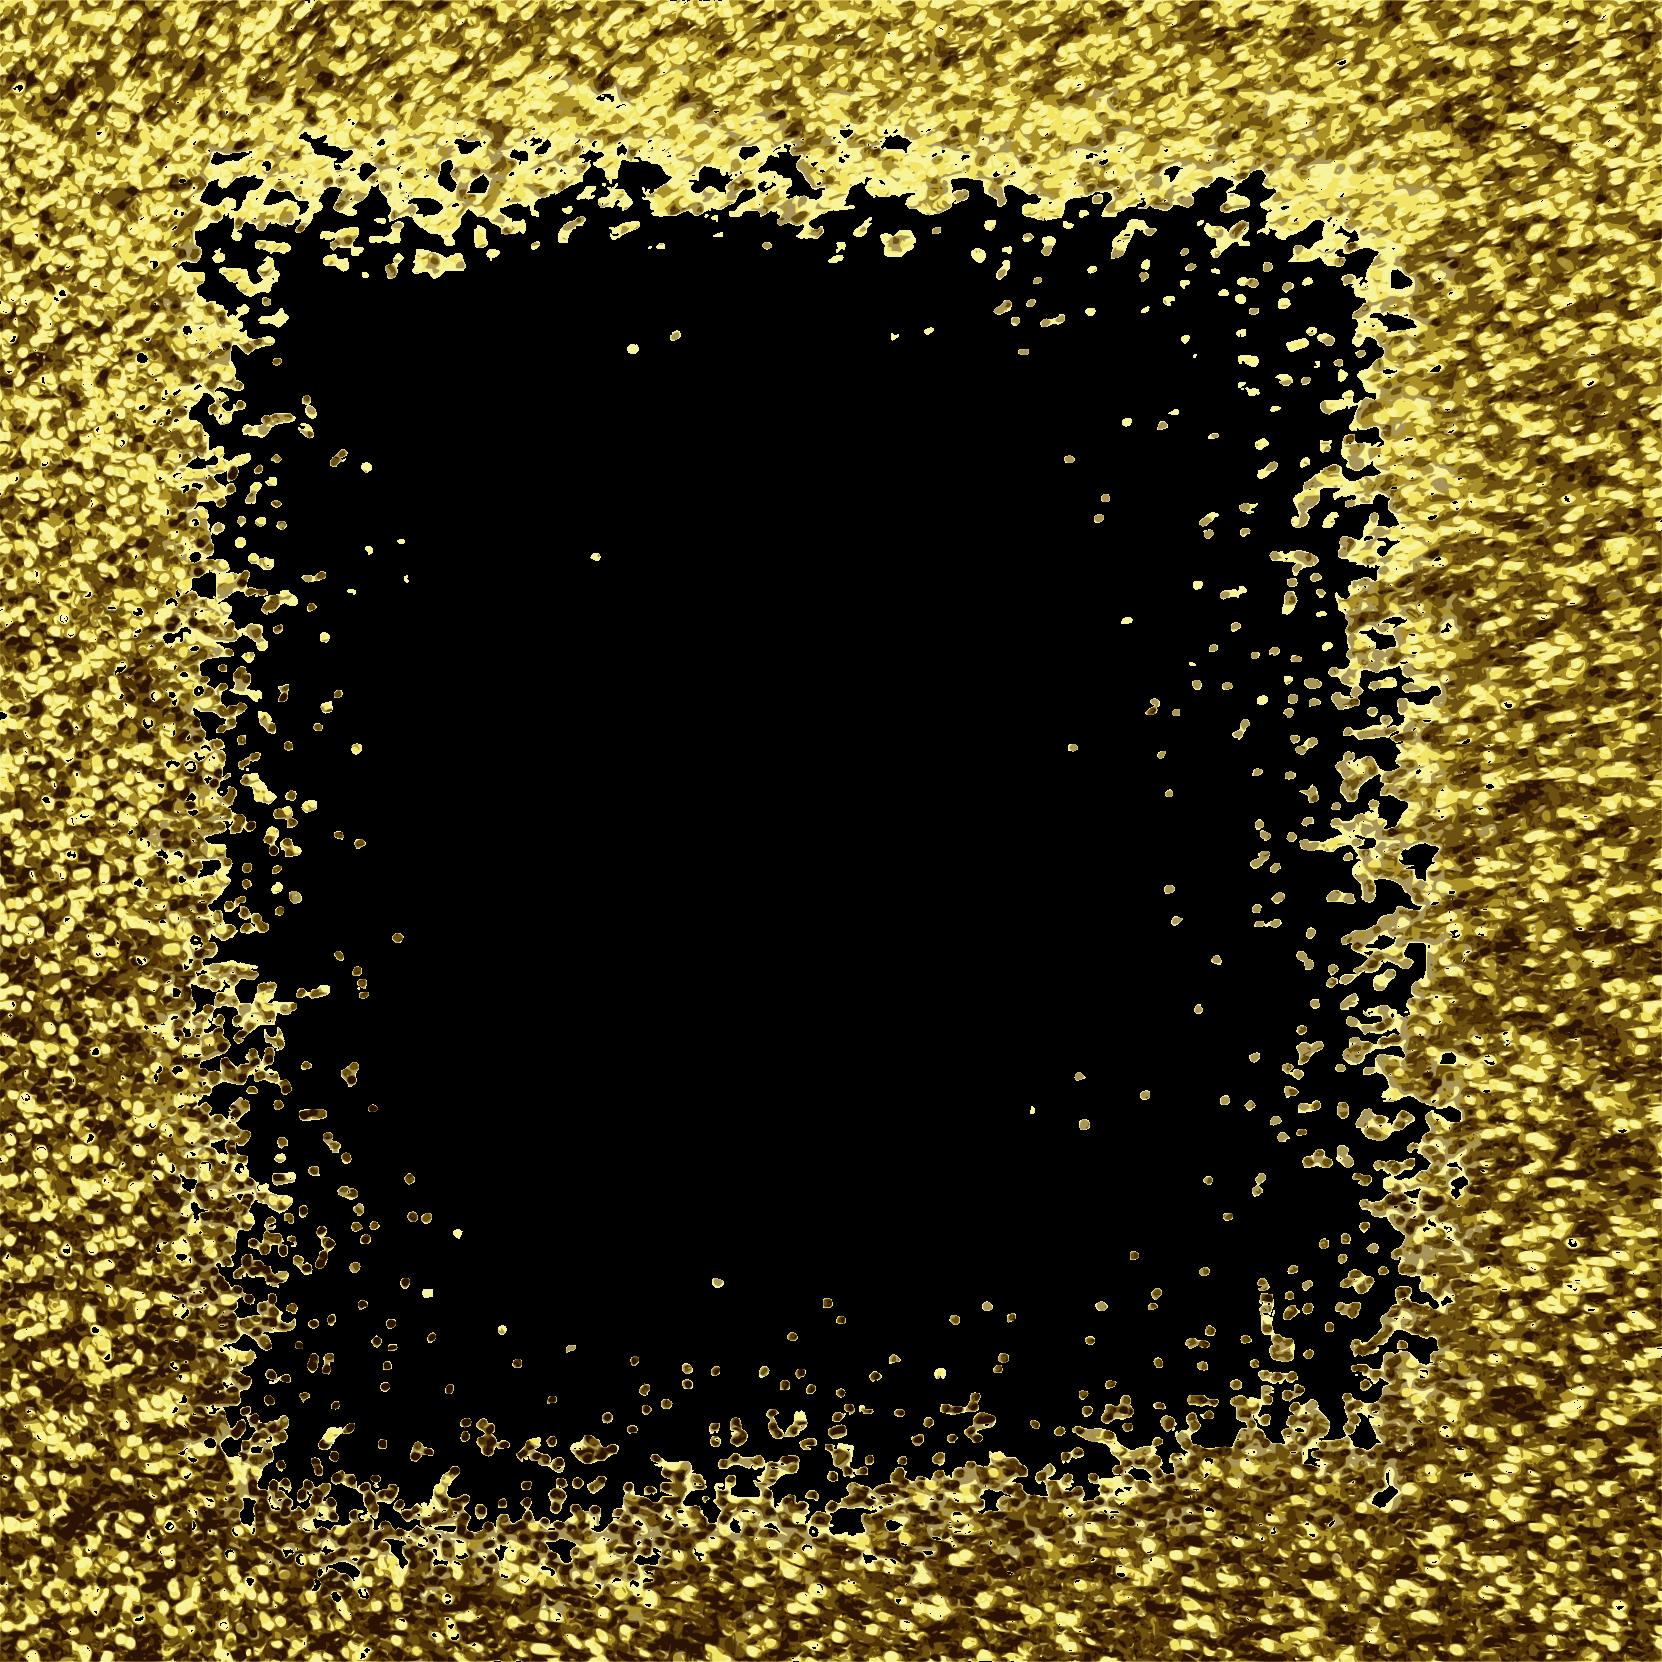 gold-glitter-frame-4.png